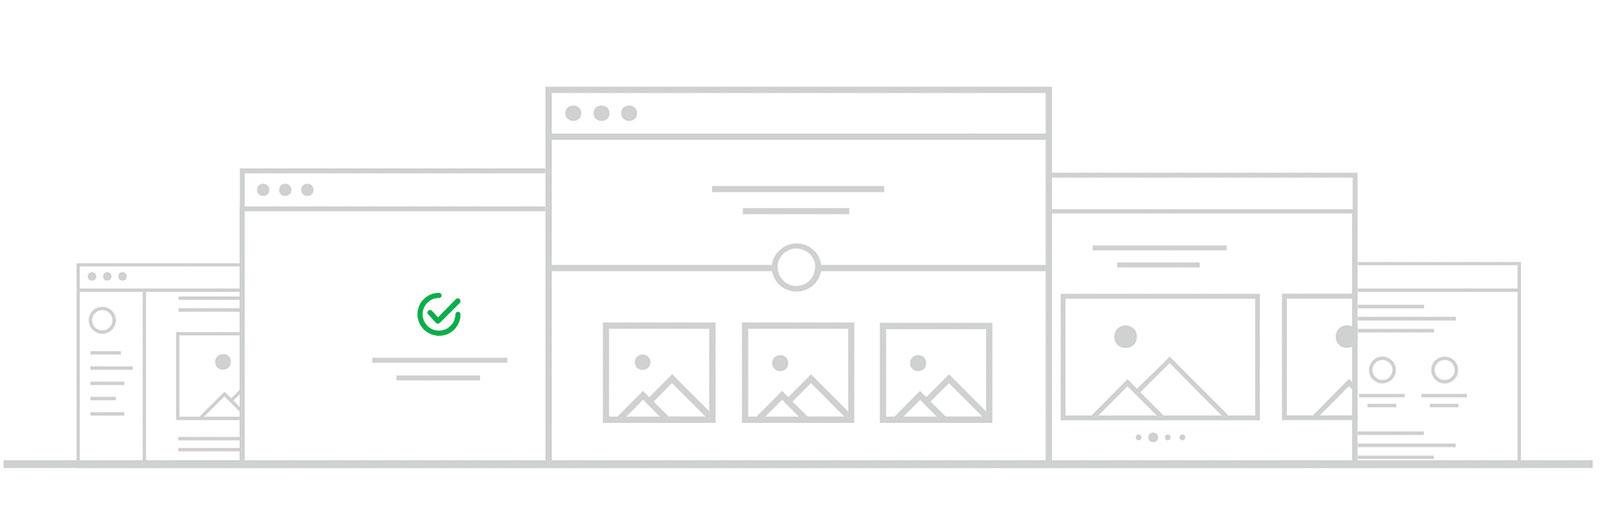 desktop windows illustration